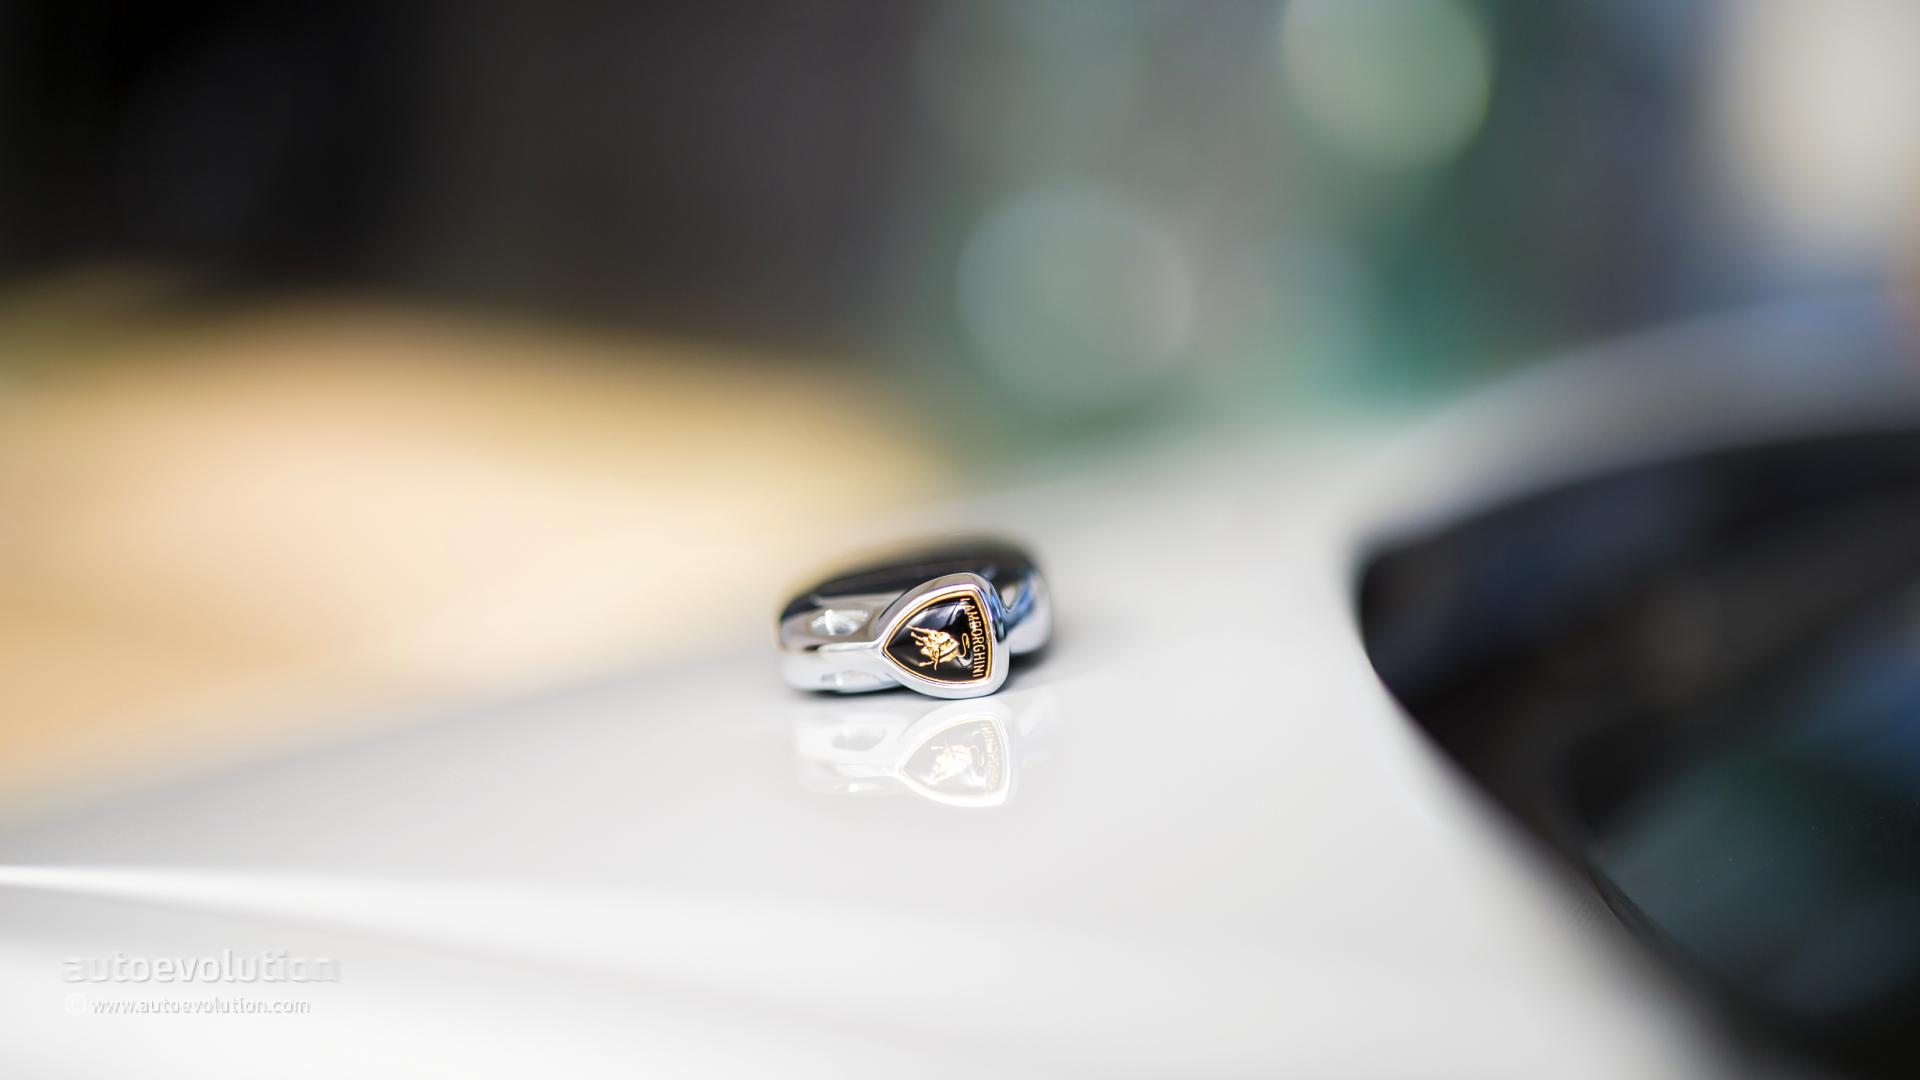 Lamborghini Huracan Lp 610 4 Review Autoevolution